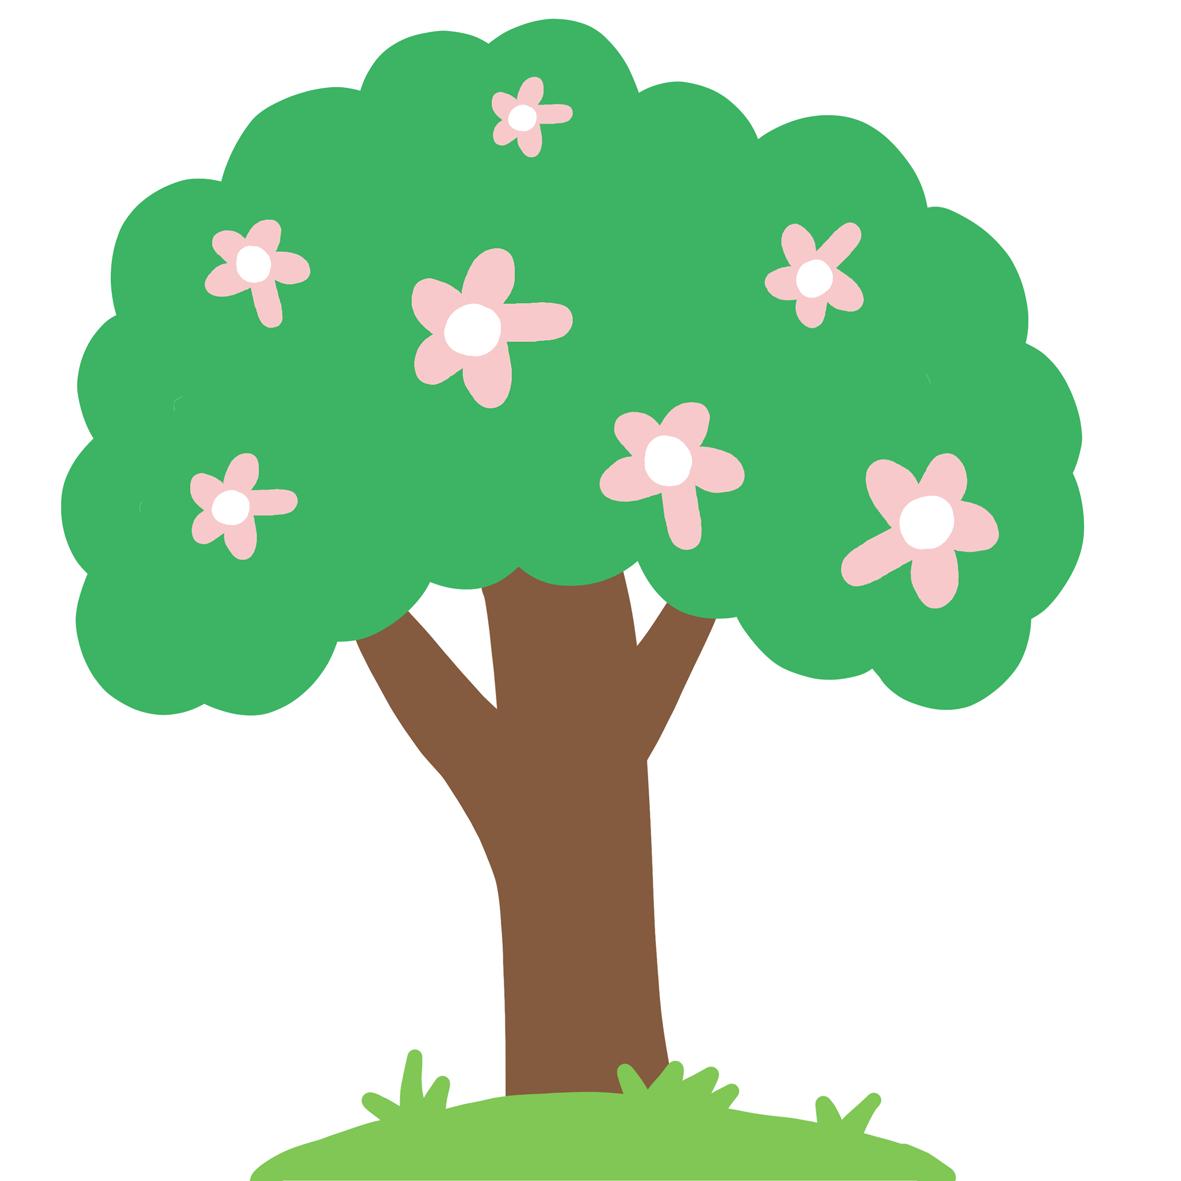 kleuters oefenen, tellen, hoeveel bloemen tel je? seizoenen, lente